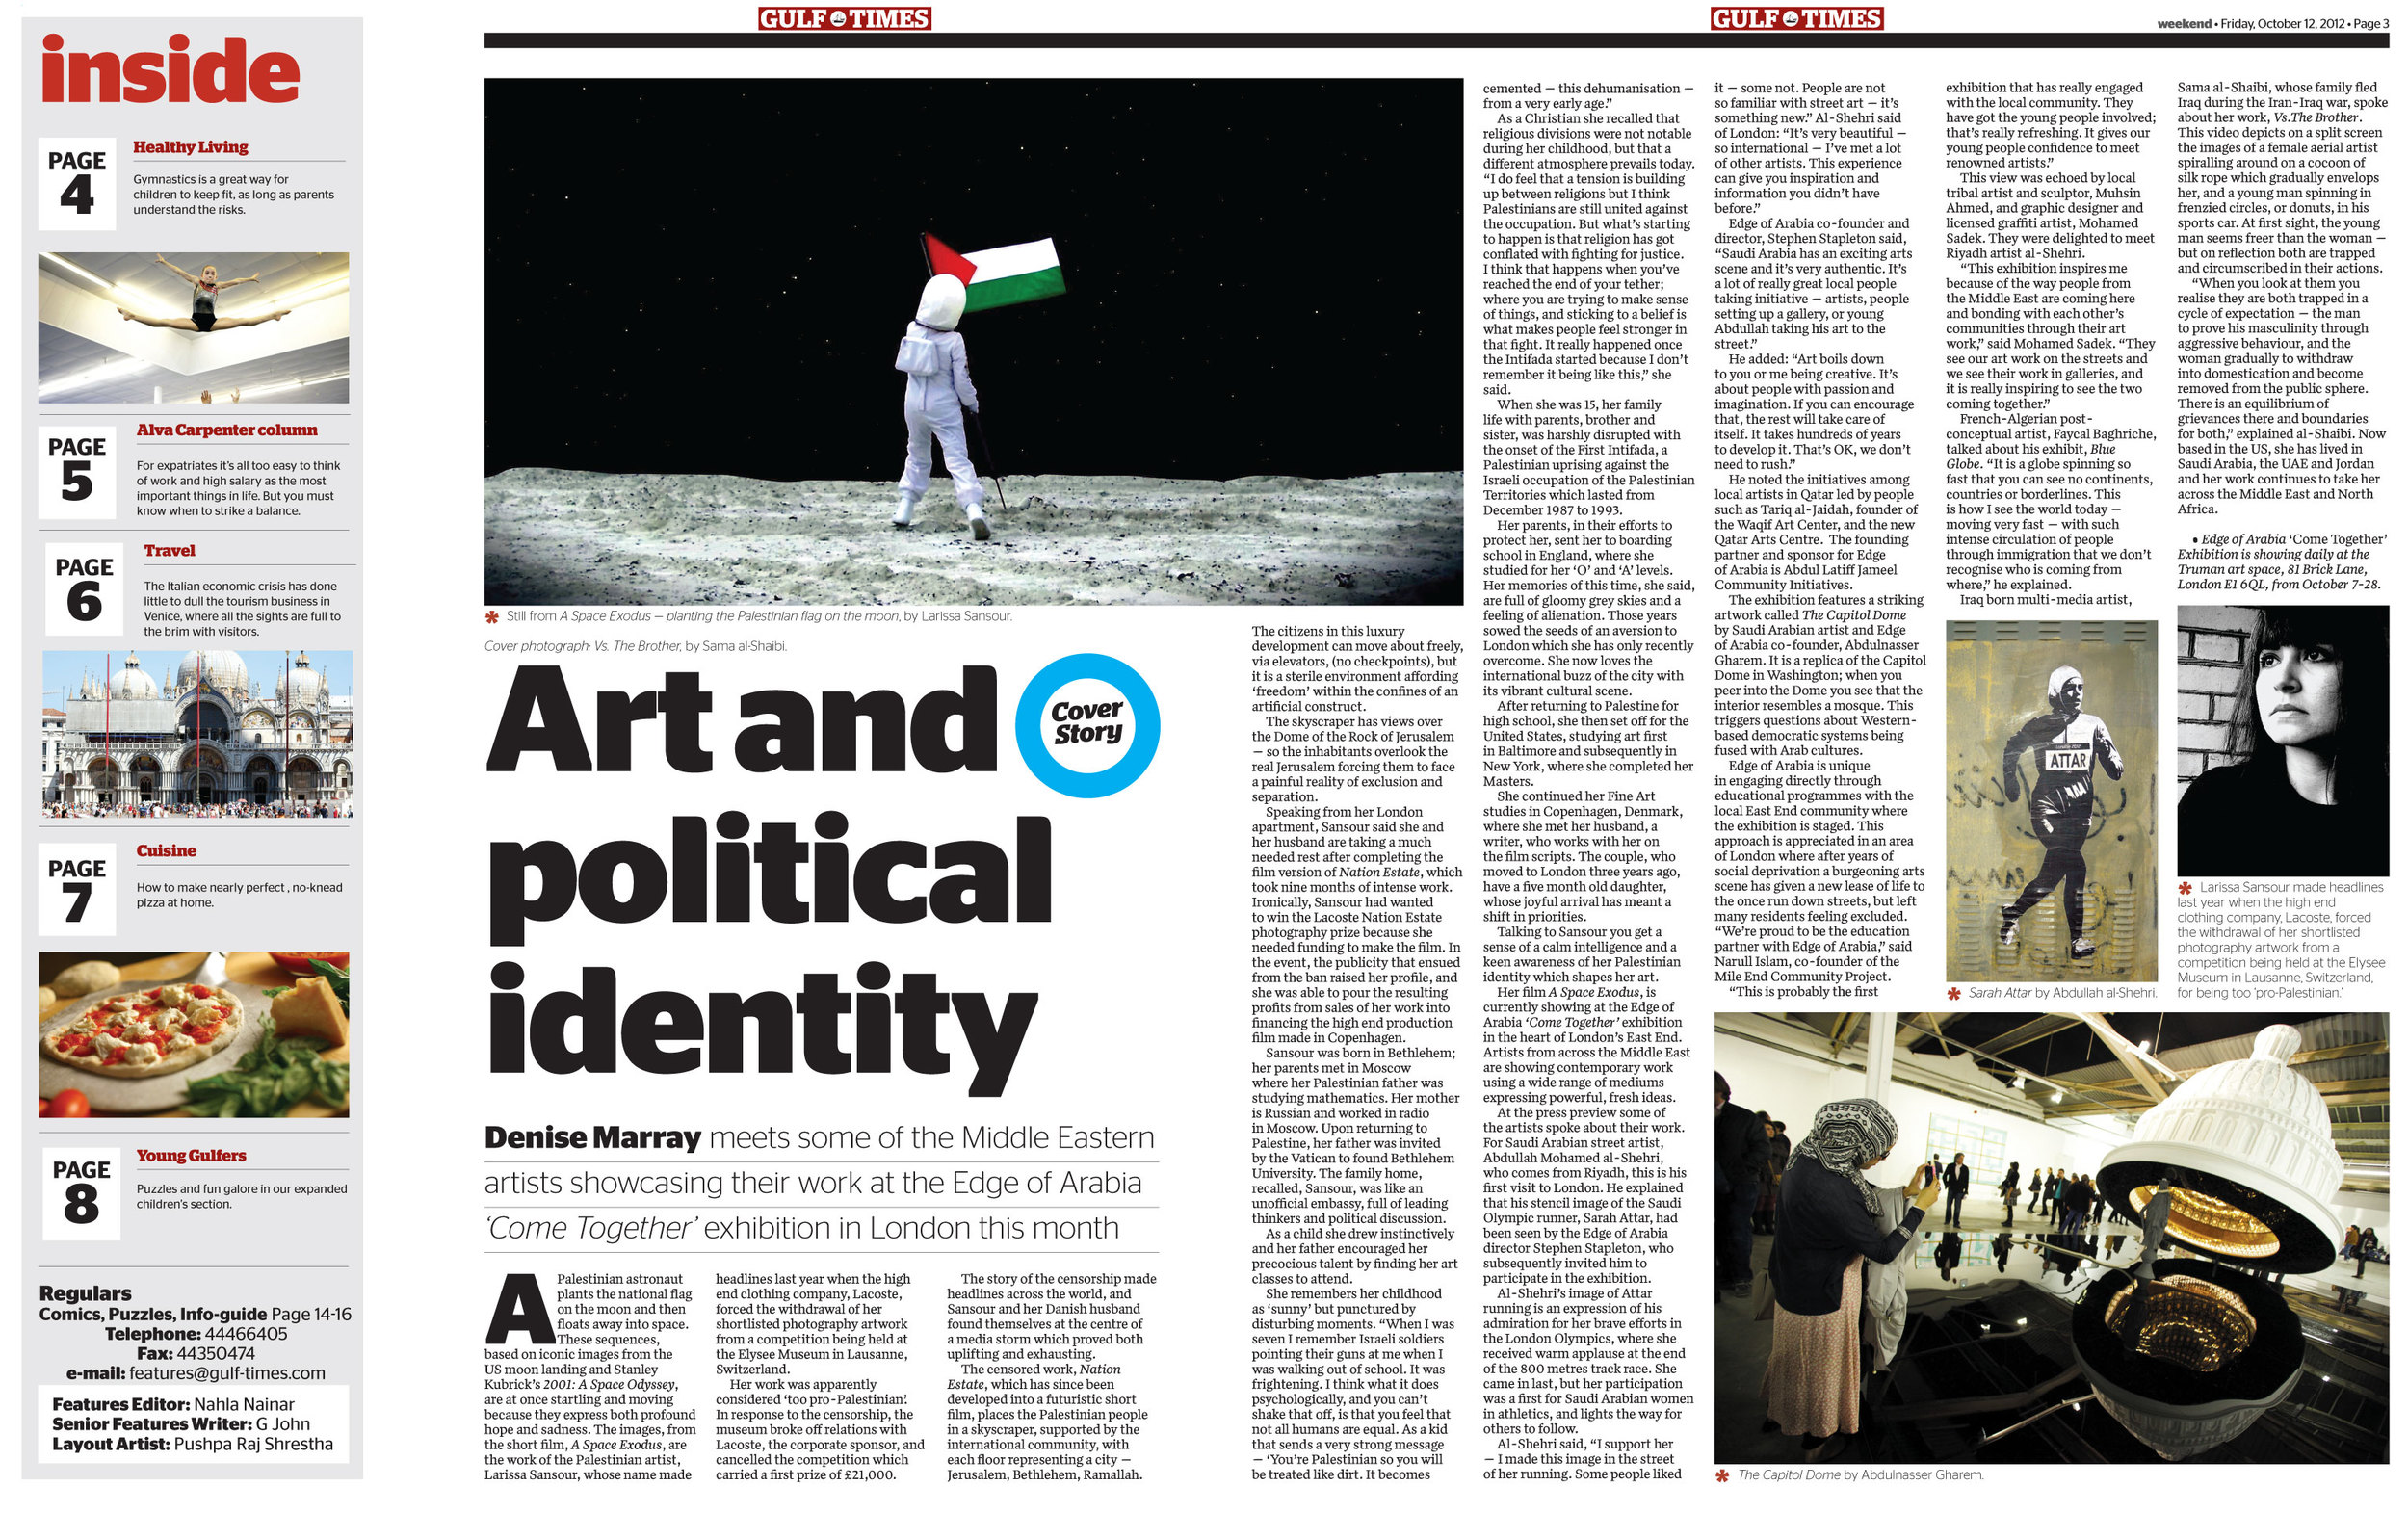 Gulf-Times-Weekend-Main-12.10.jpg